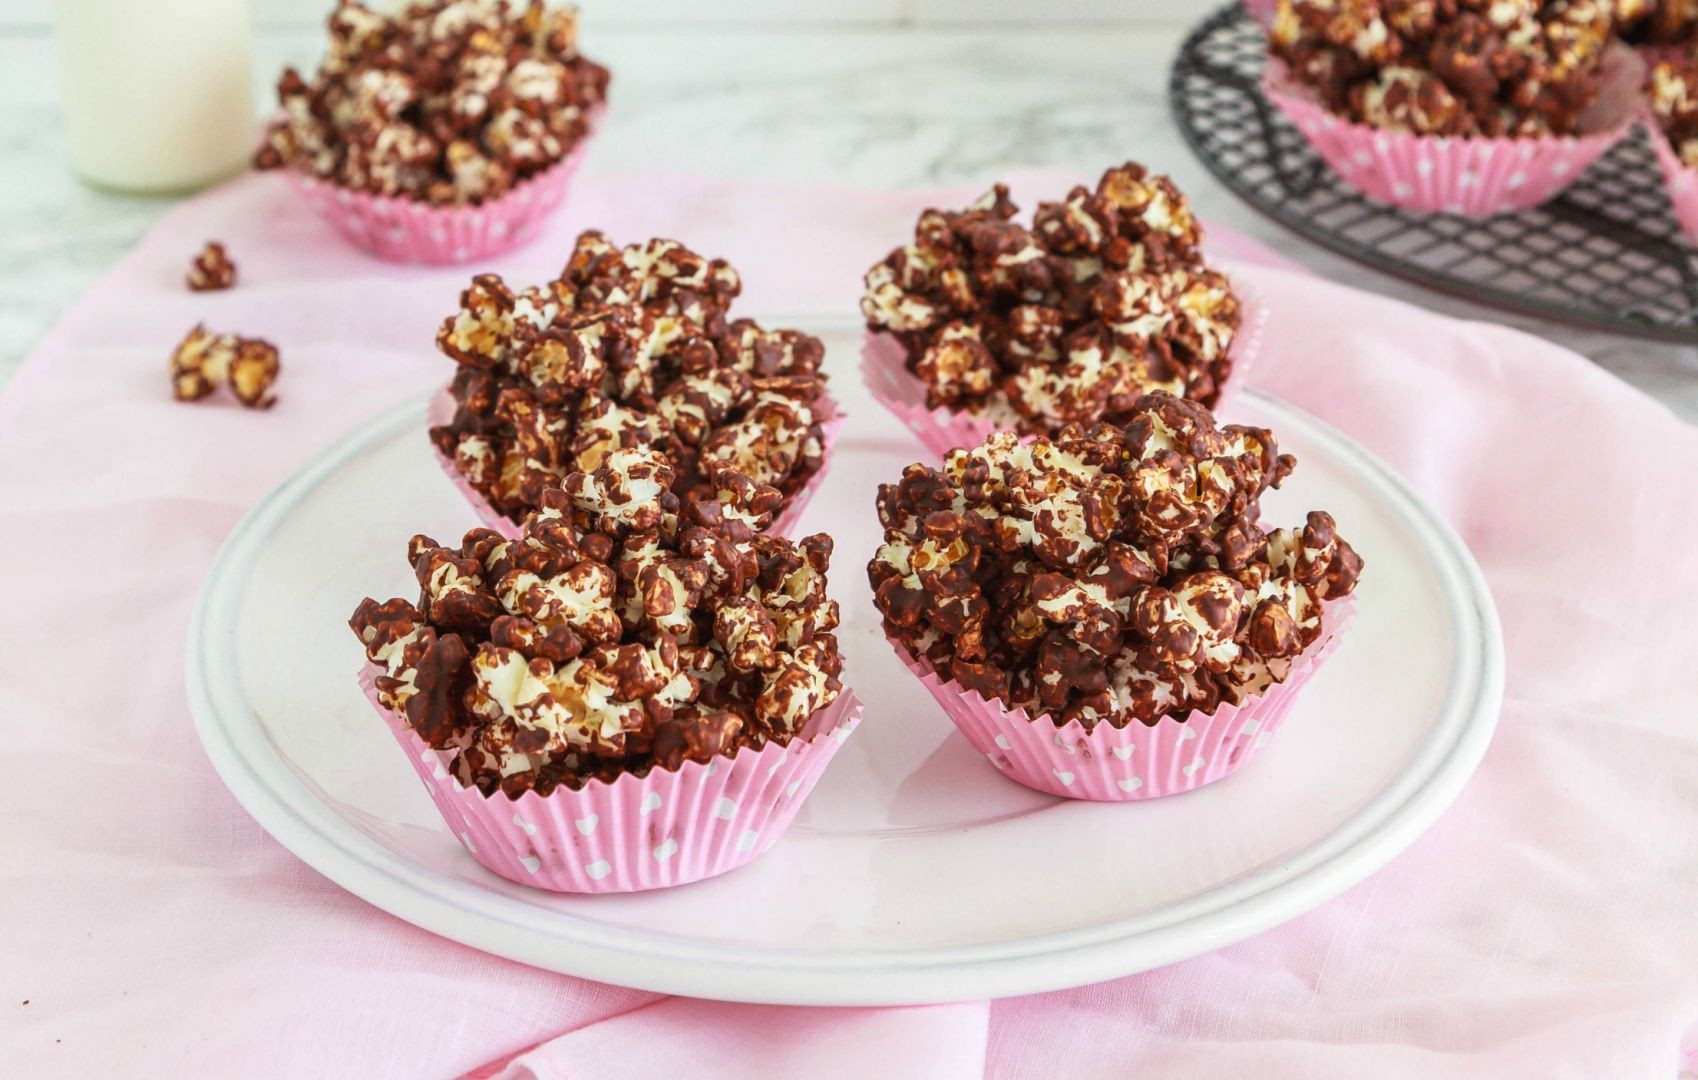 Best Healthy Sweet Snacks  Lose Baby Weight 5 Healthy Sweet Snacks For Movie Night